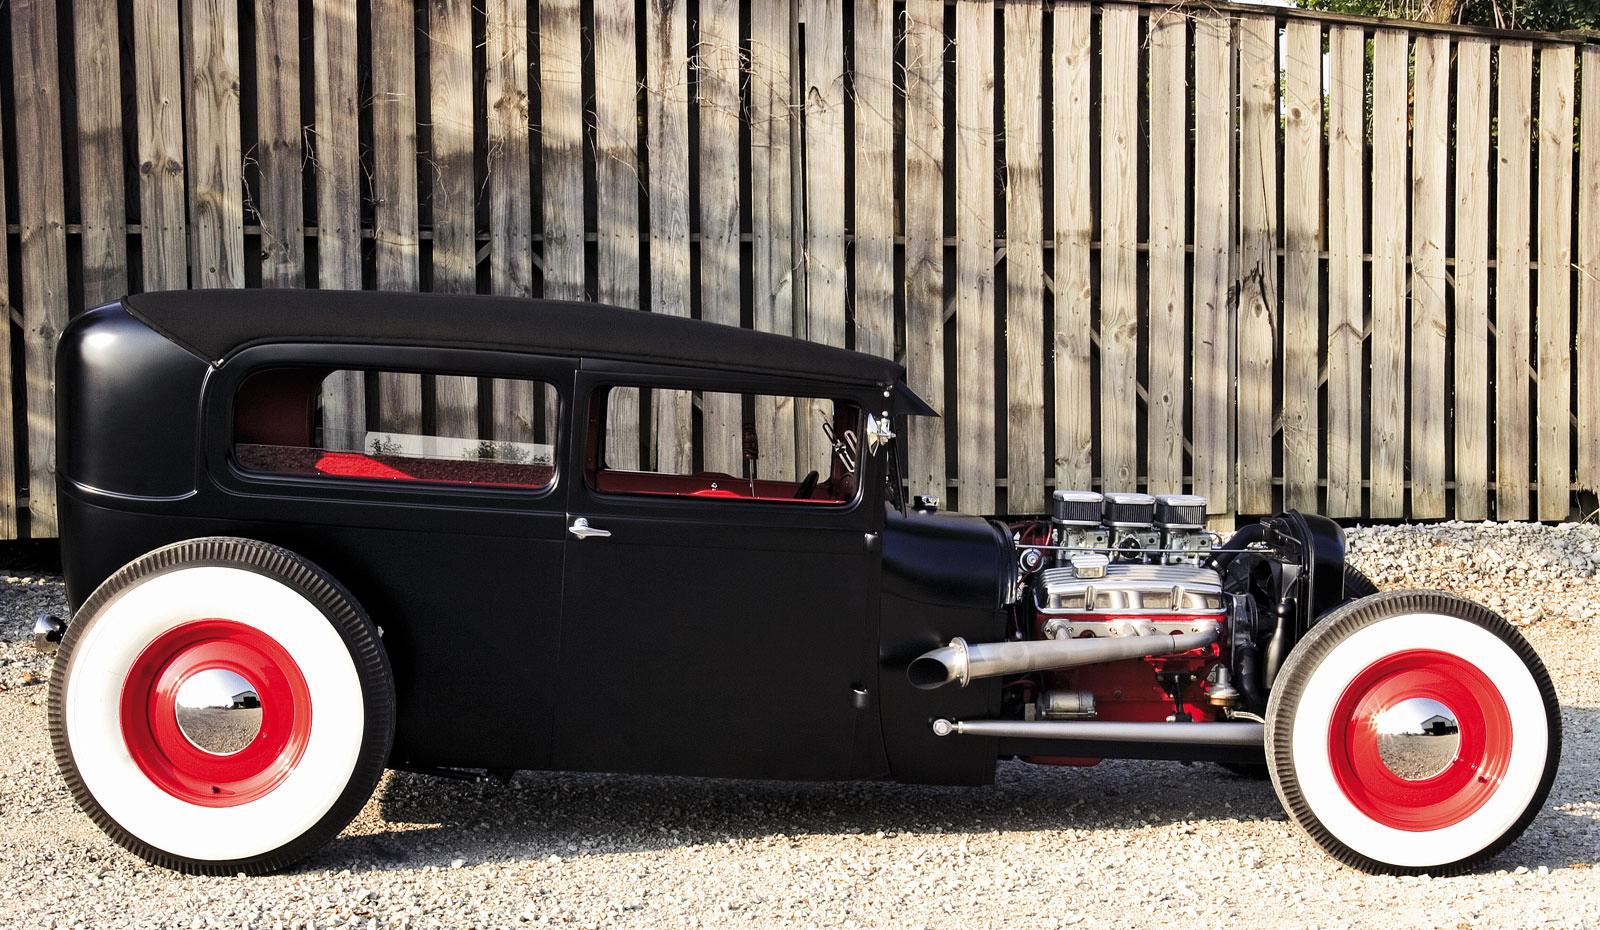 3840x1080 Wallpaper Classic Car Hot Rod Fond D 233 Cran And Arri 232 Re Plan 1600x930 Id 314347